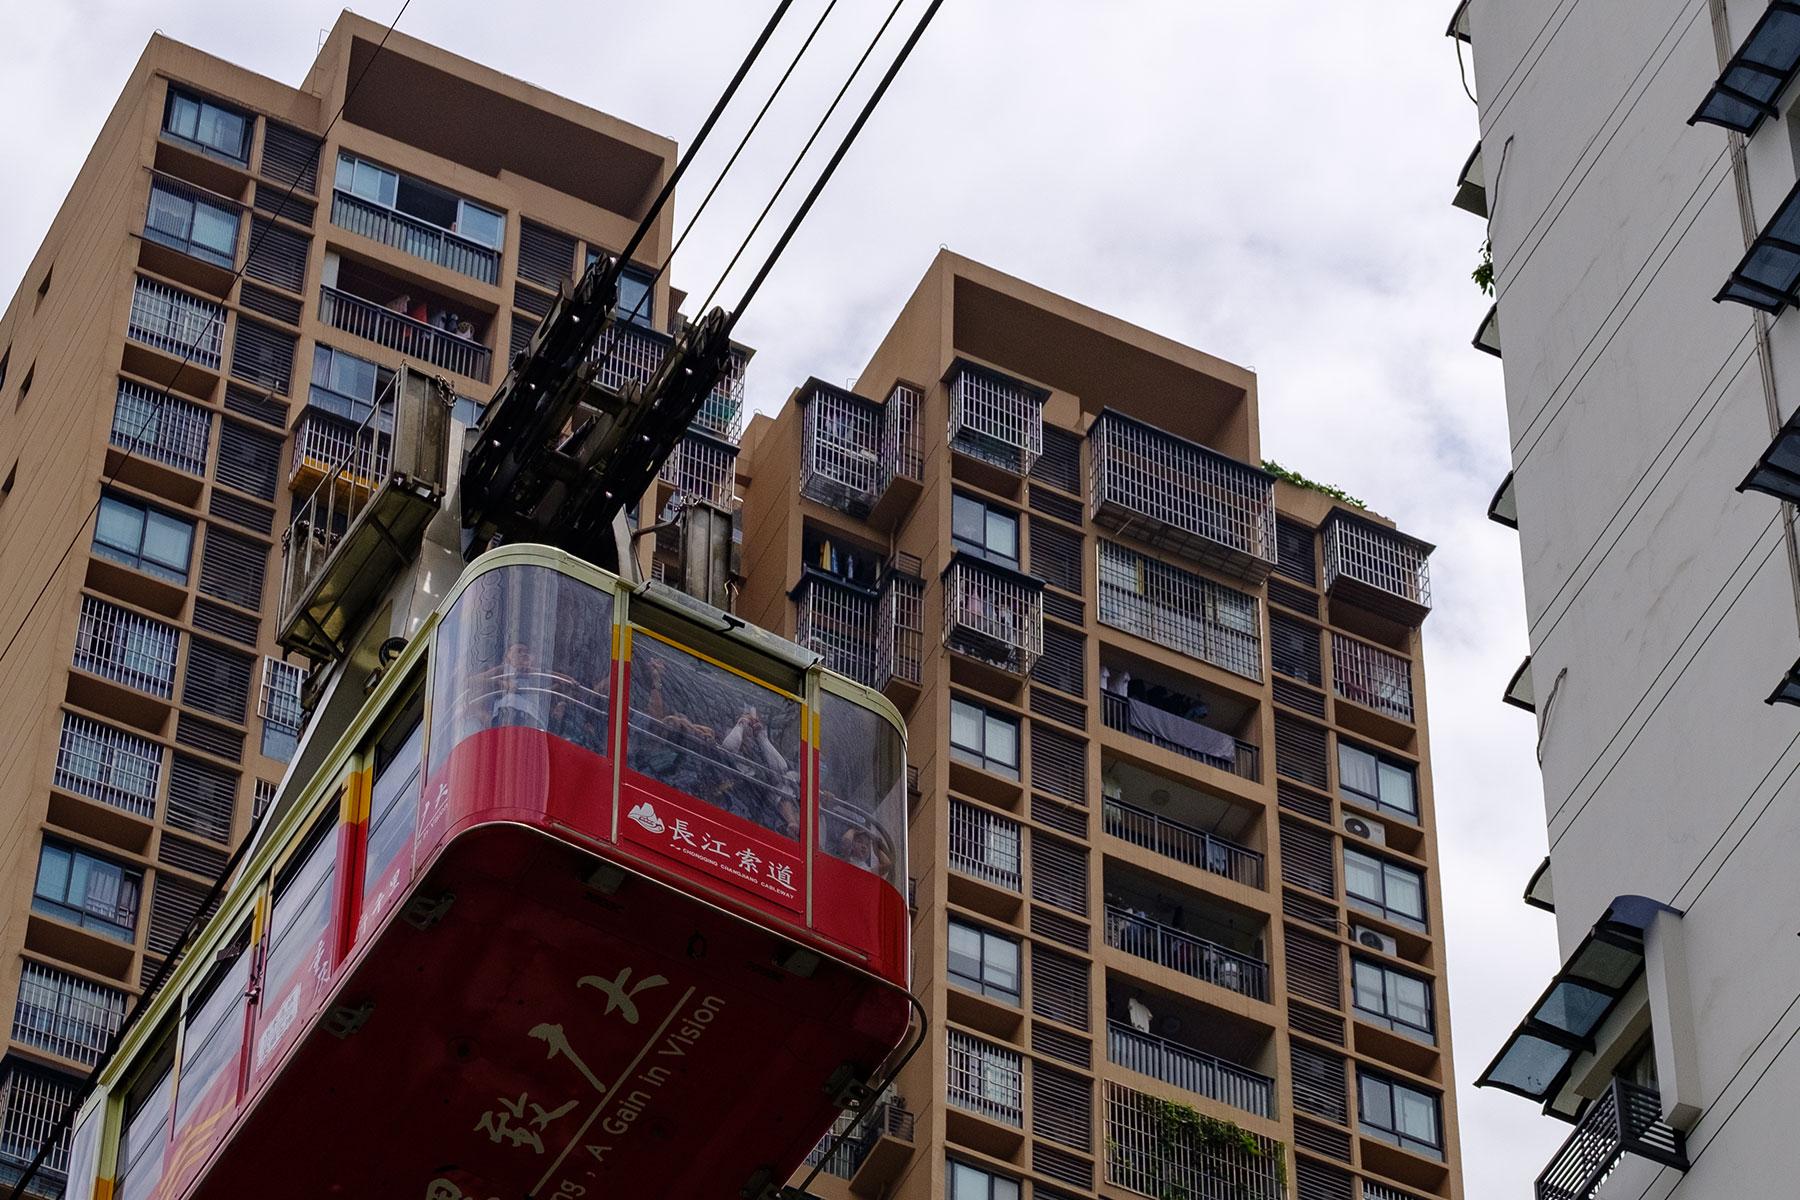 Gondel einer Seilbahn in Chongqing